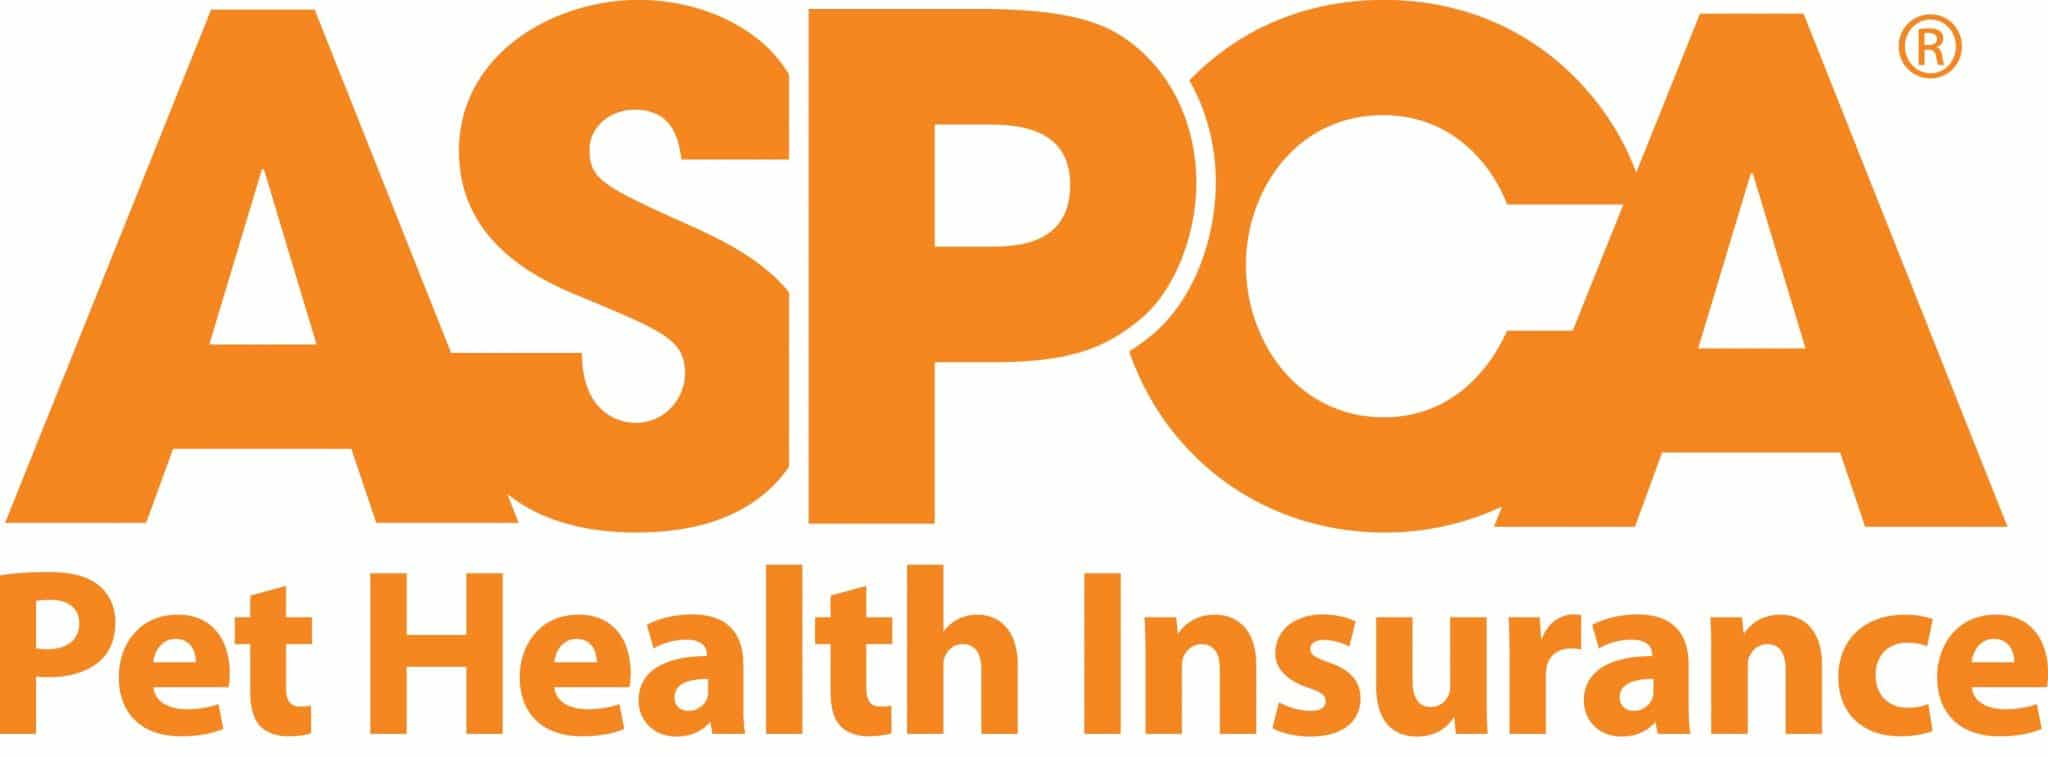 ASPCA health insurance logo